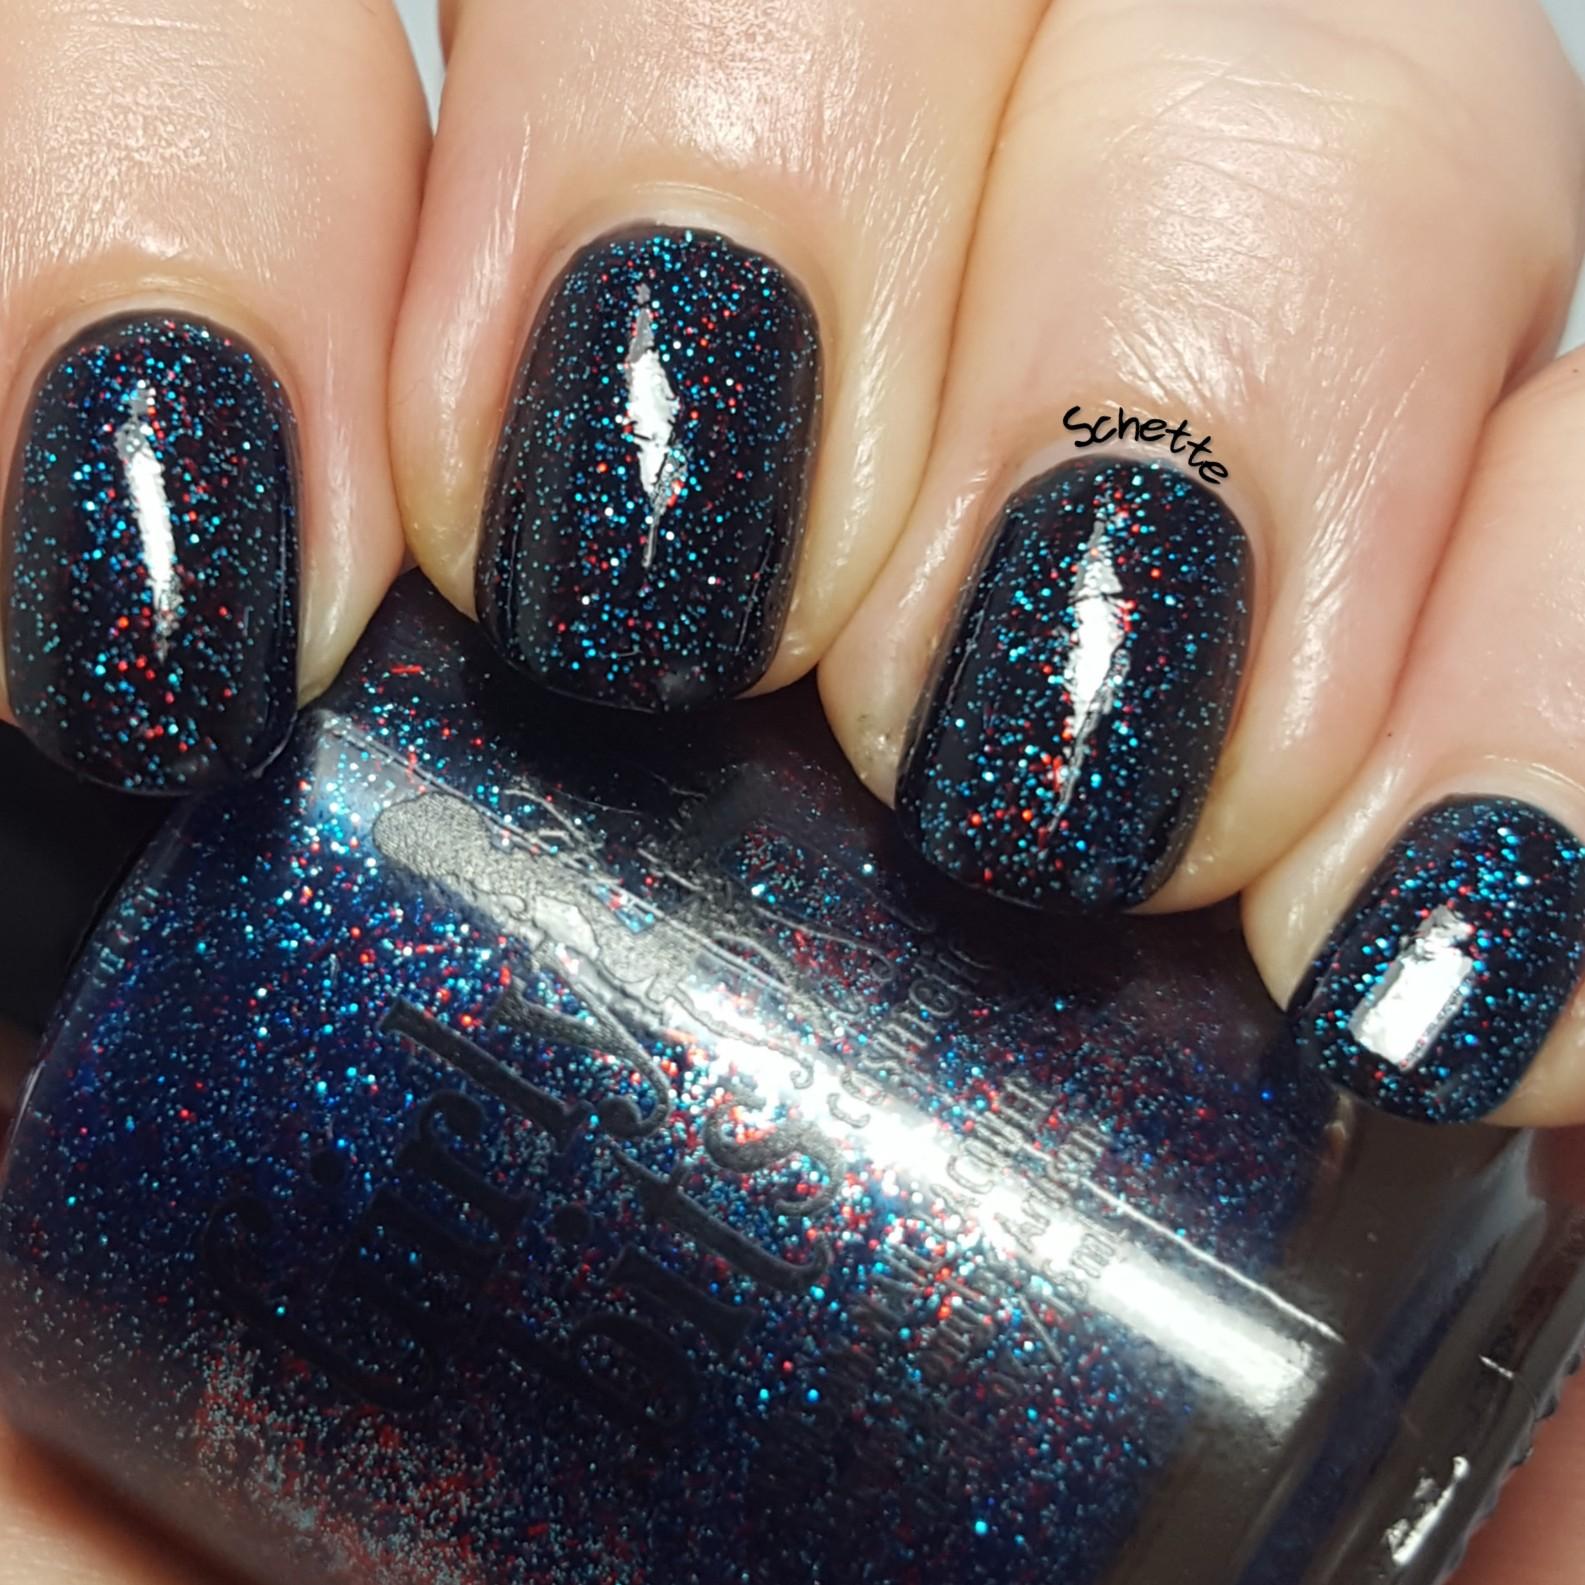 Girly Bits - Star Spangled